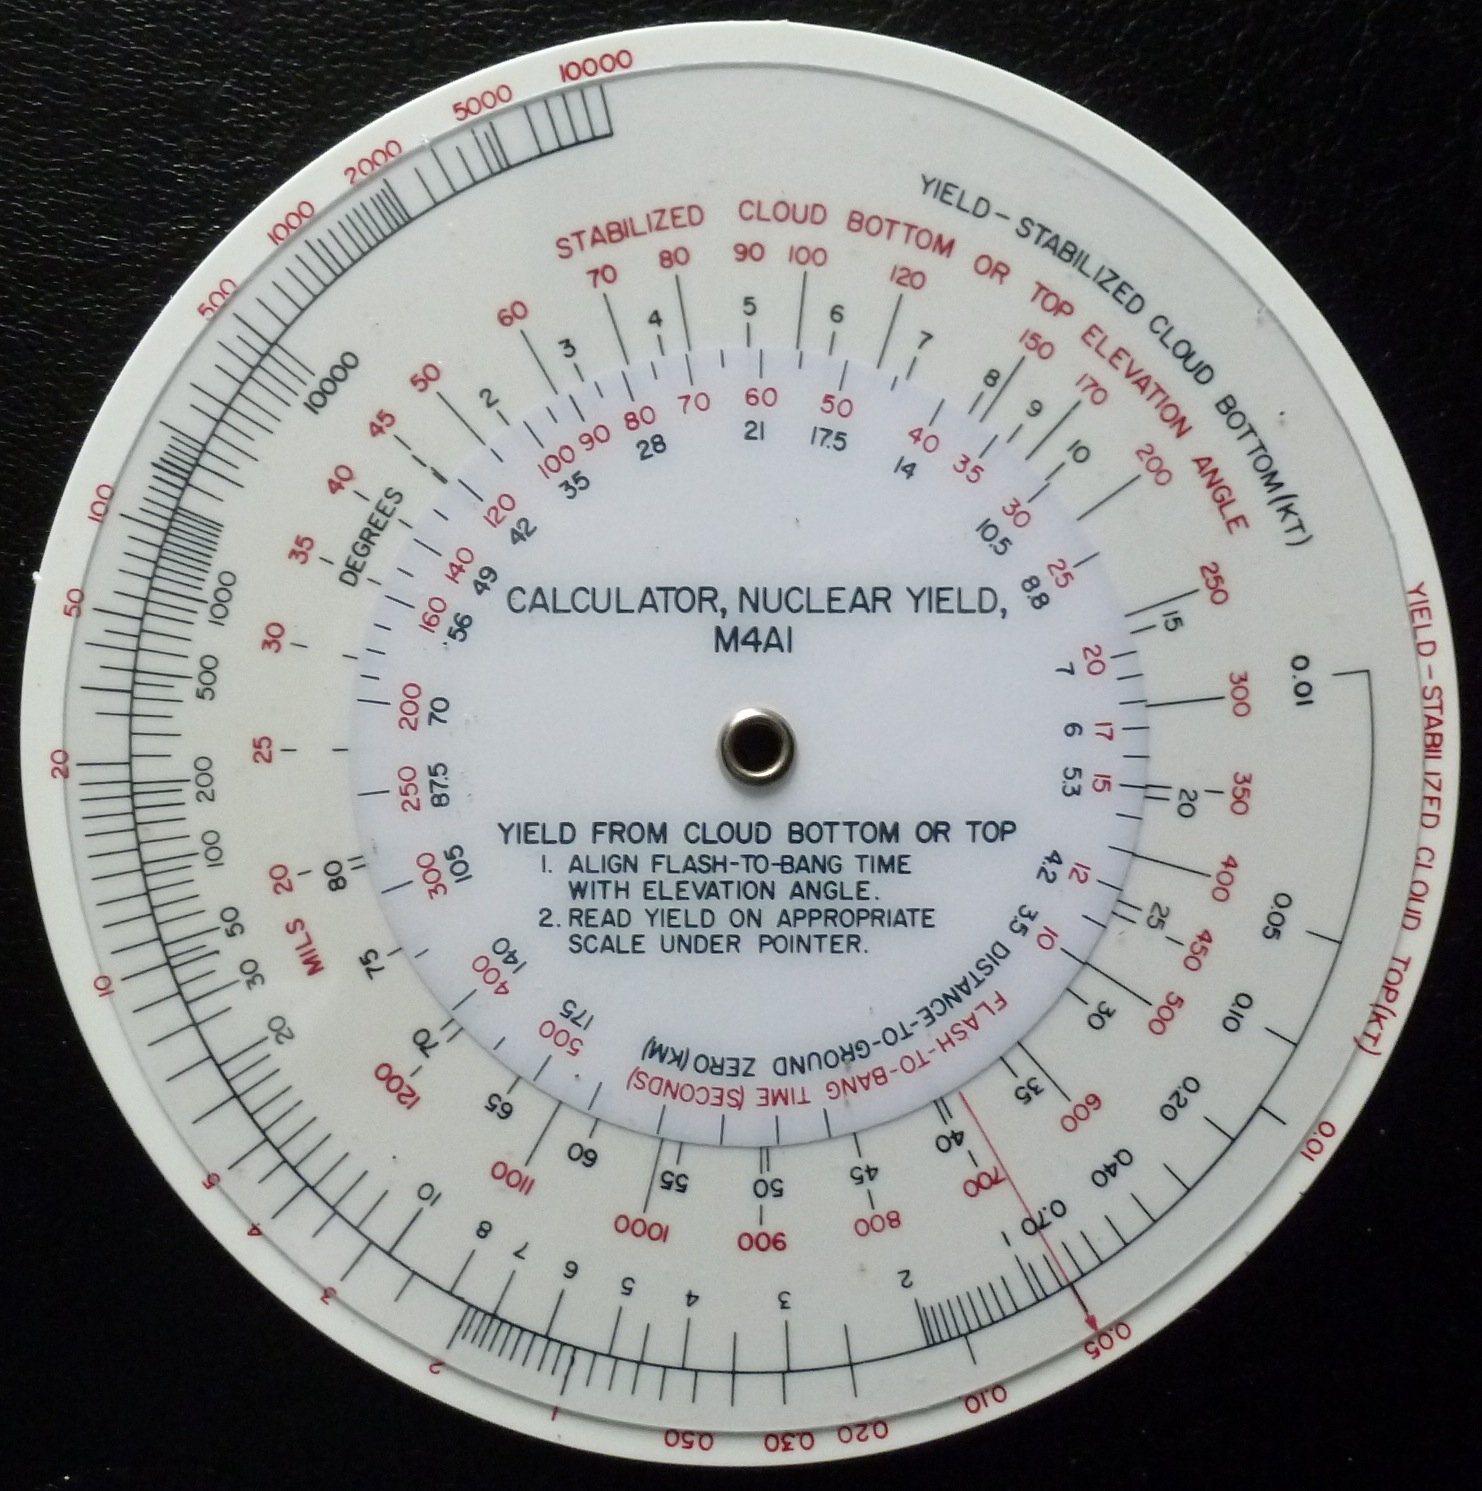 regle-circulaire-radioactivite-10